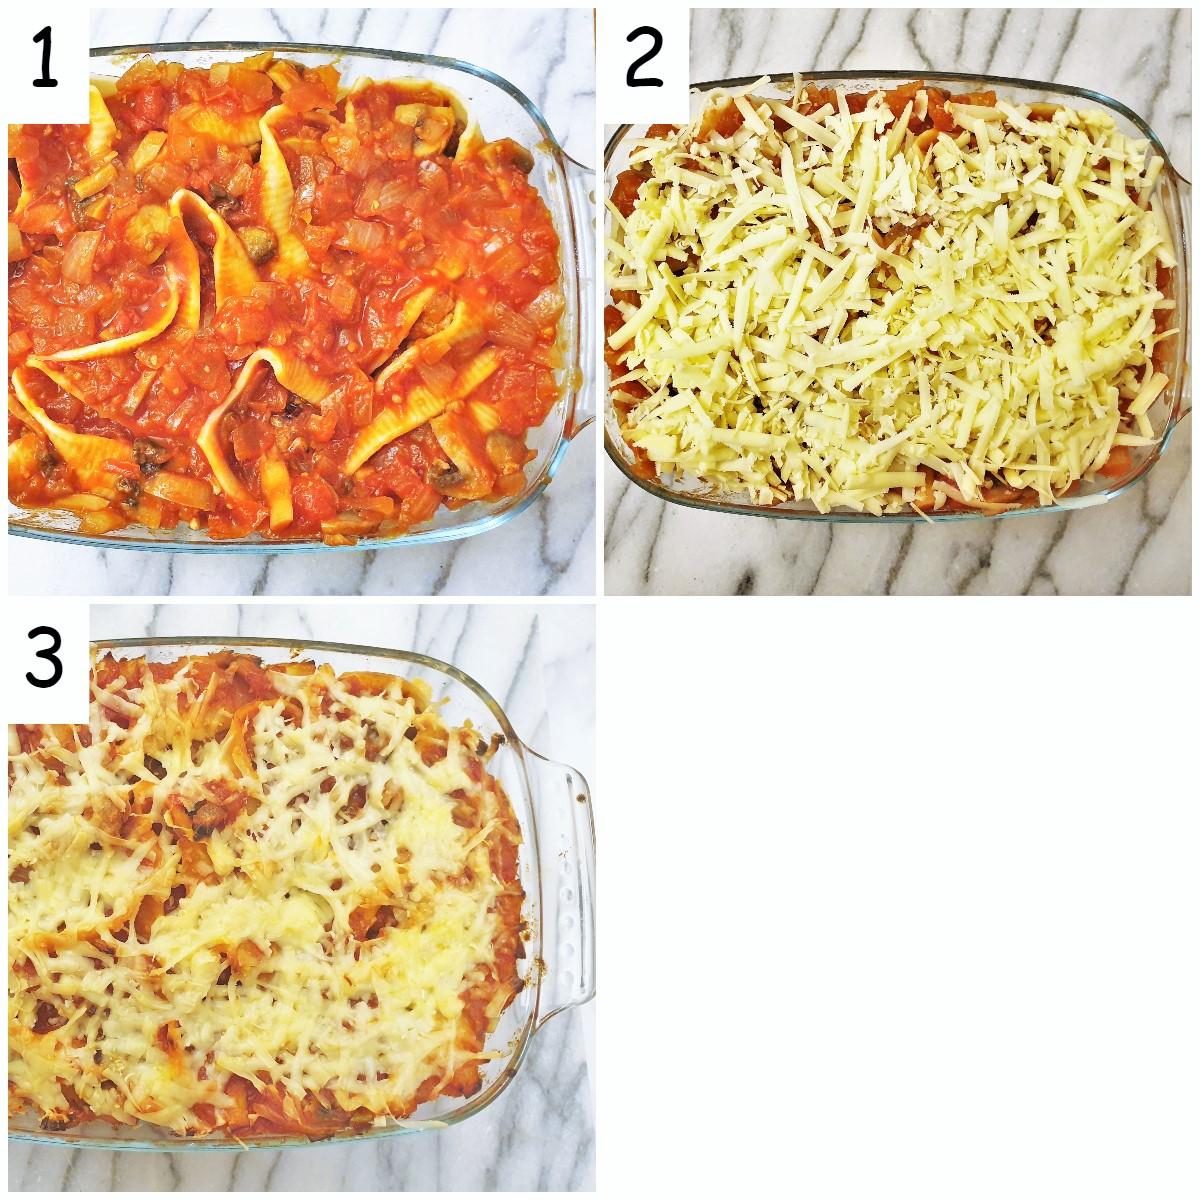 Steps for assembling and baking the meatballs in jumbo pasta shells.